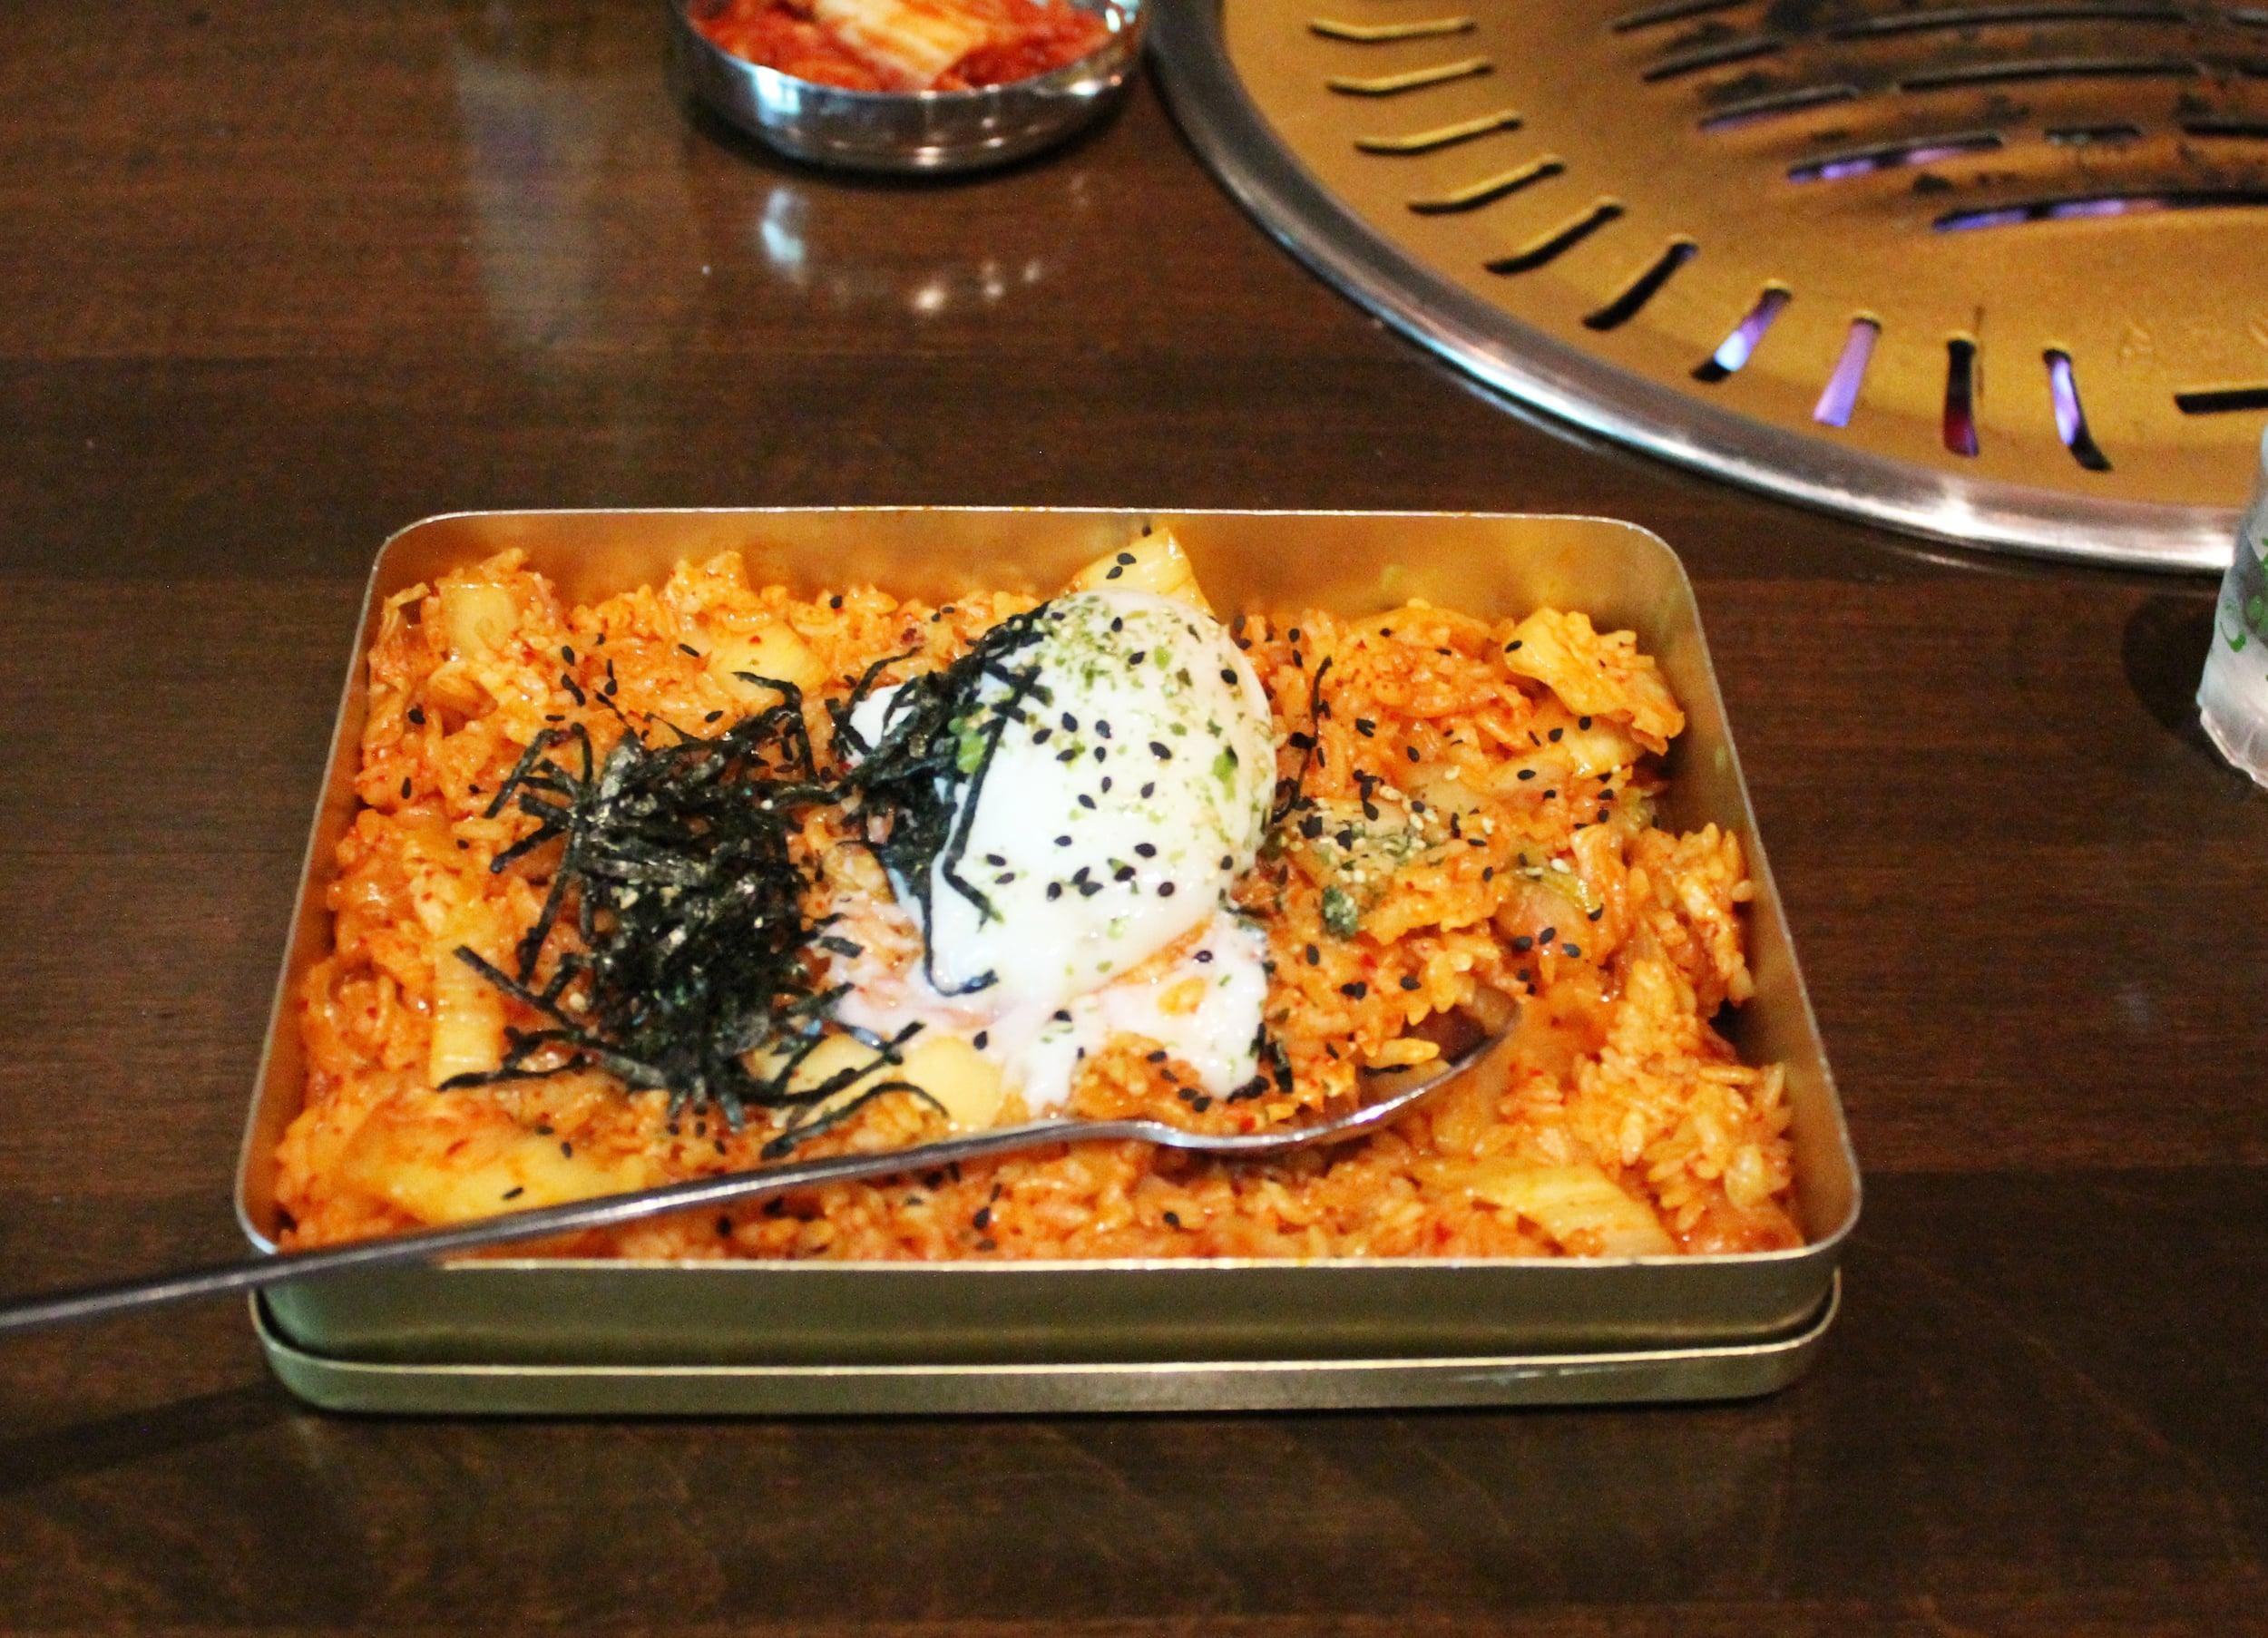 The Kimchi Fried Rice at Hanjip